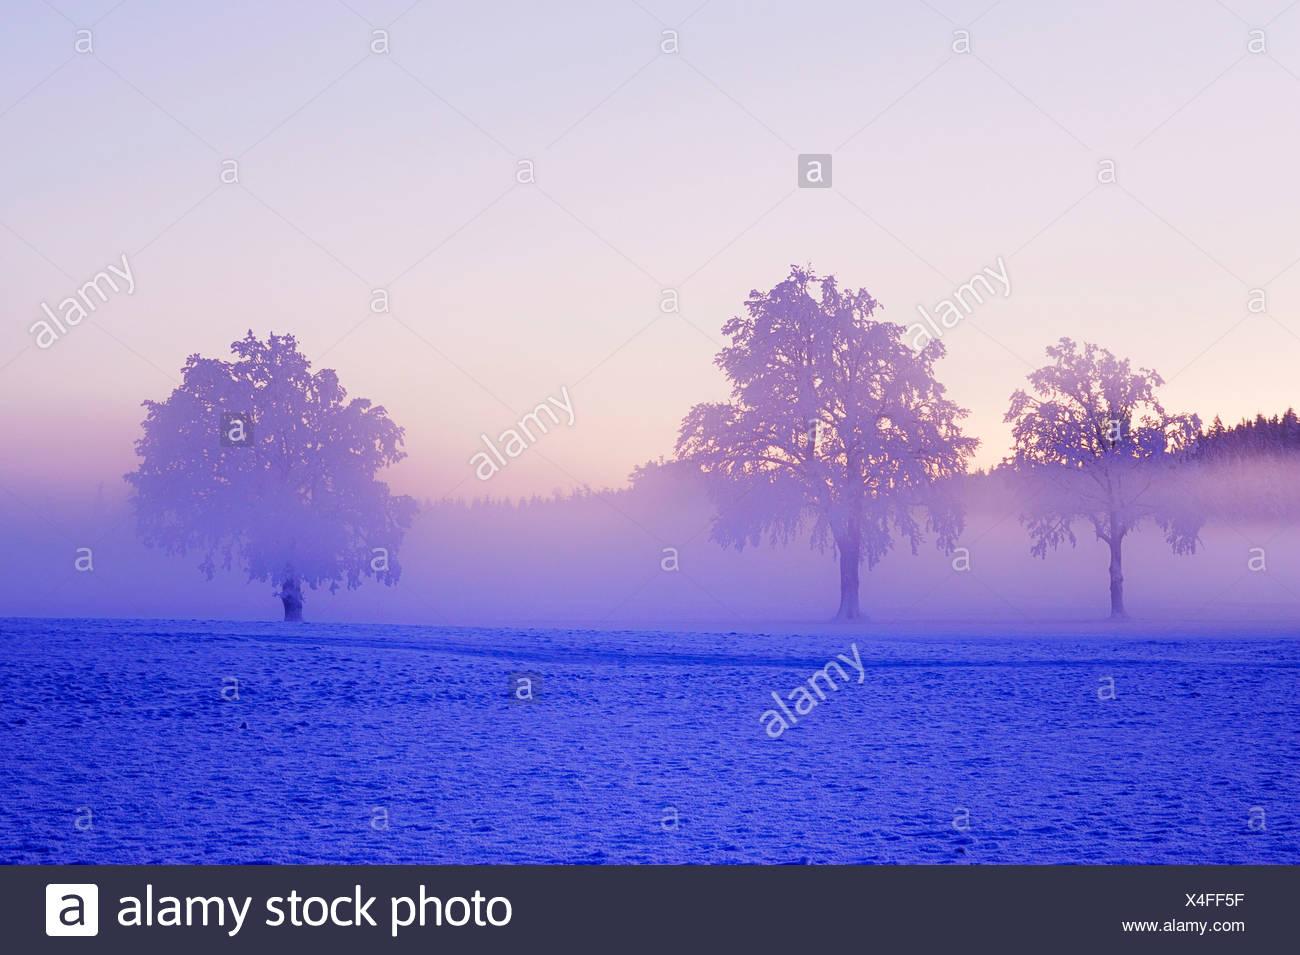 Paysage d'hiver enveloppée de brouillard, Oberkirch, Argovie, Suisse, Europe Photo Stock